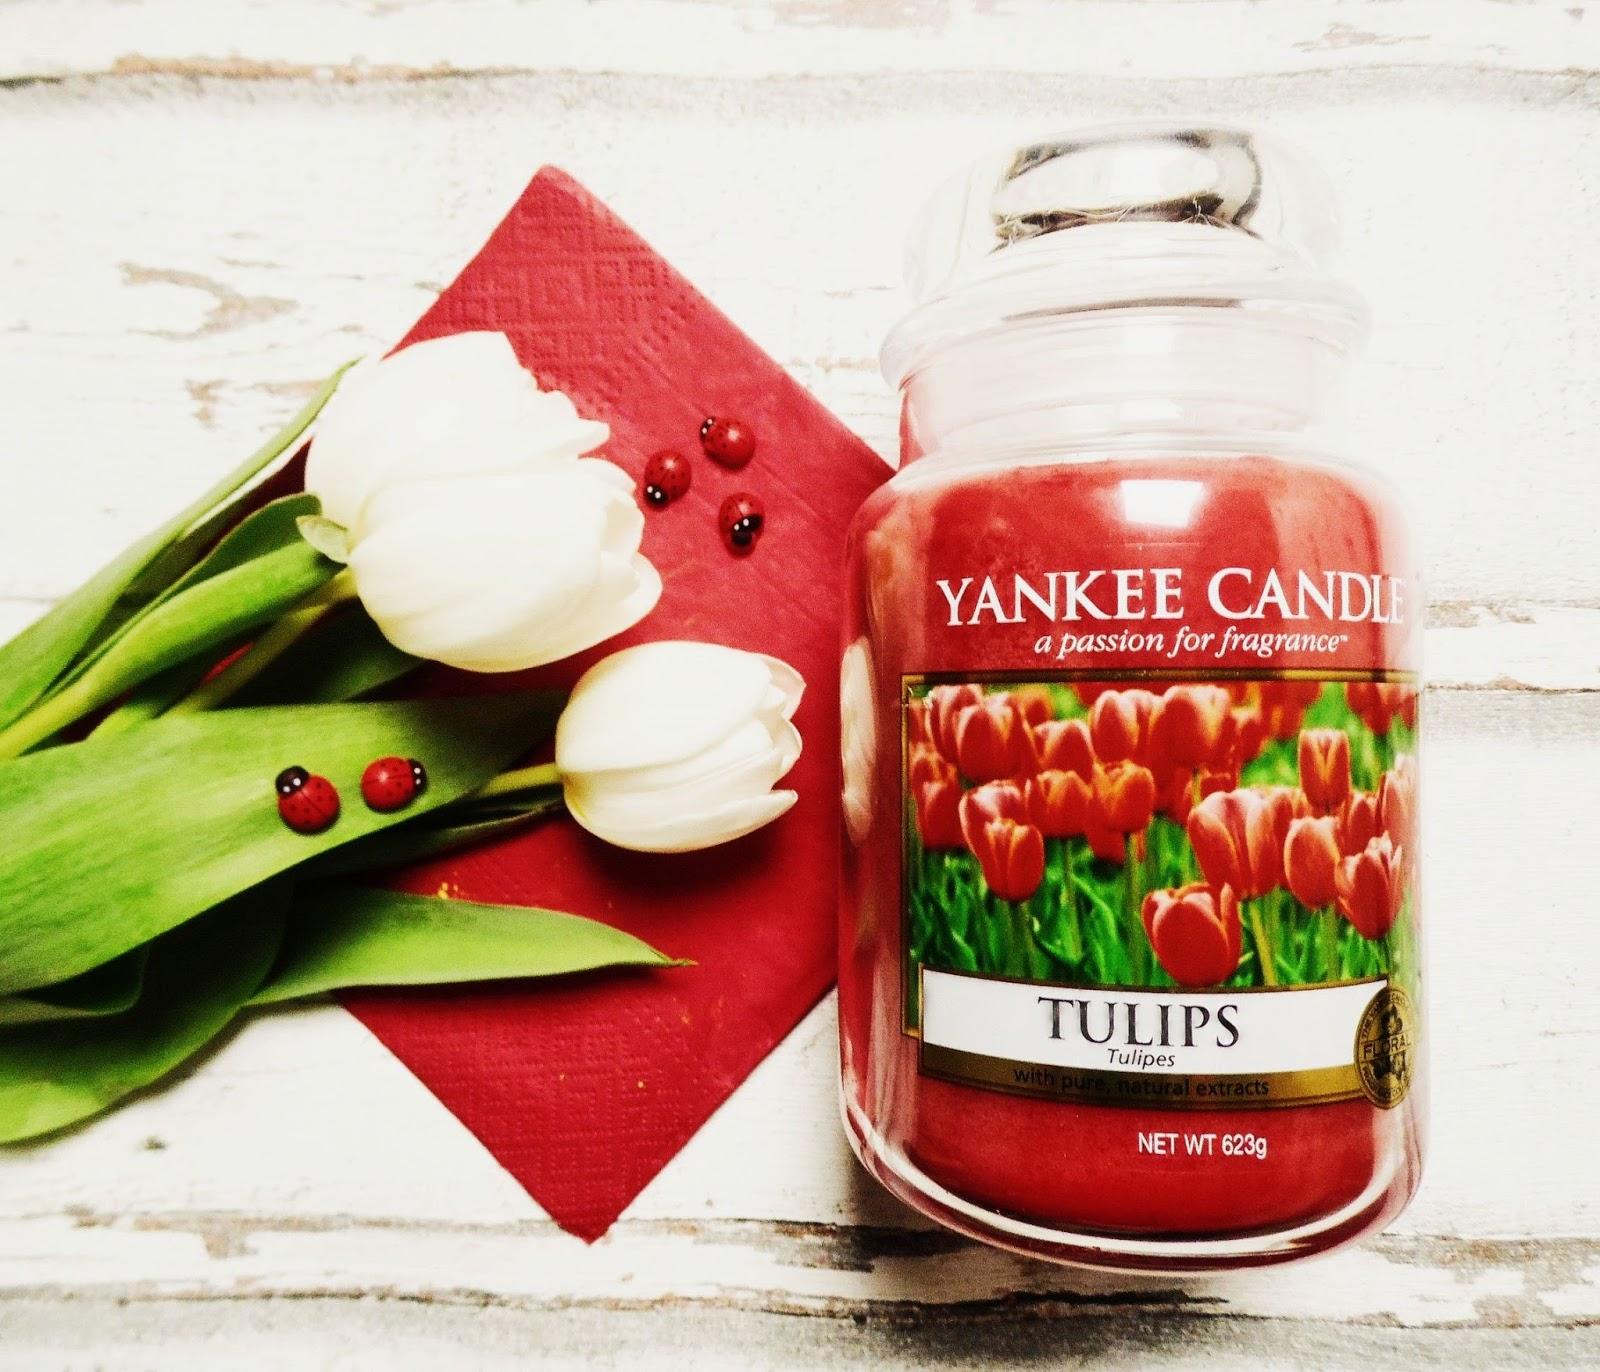 Tulips Yankee Candle  recenzja